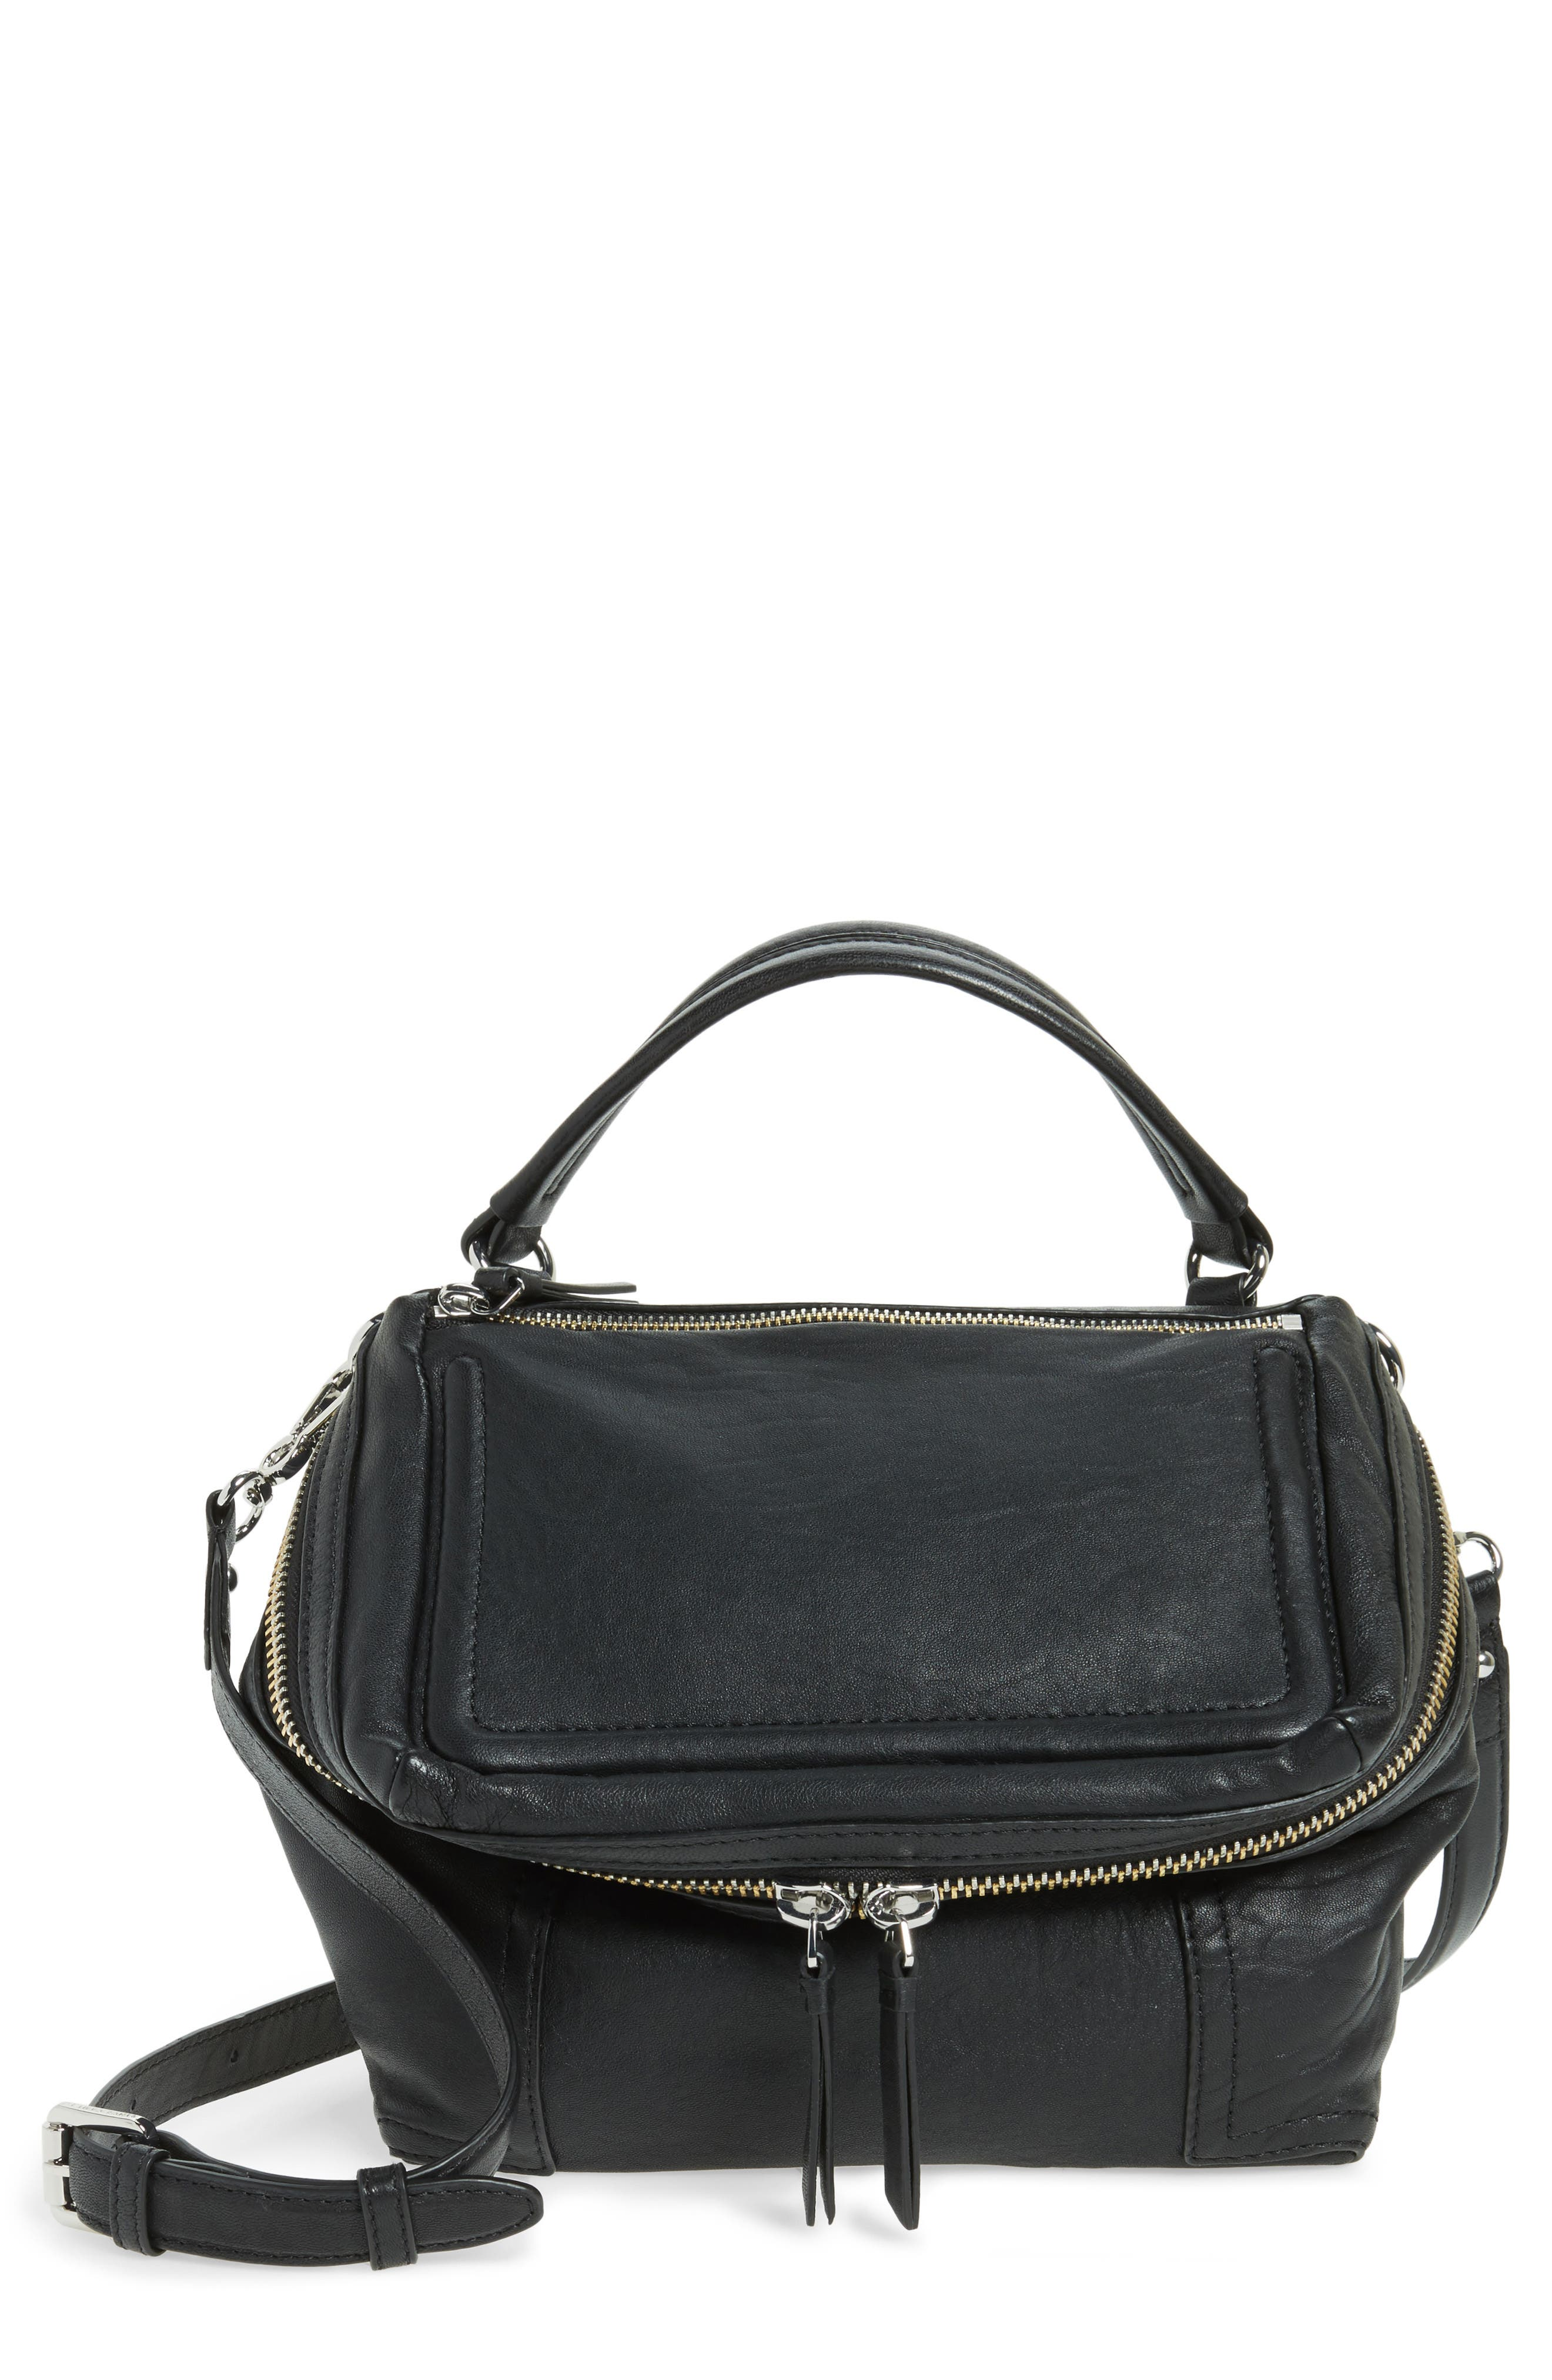 Medium Patch Leather Crossbody Bag,                         Main,                         color,